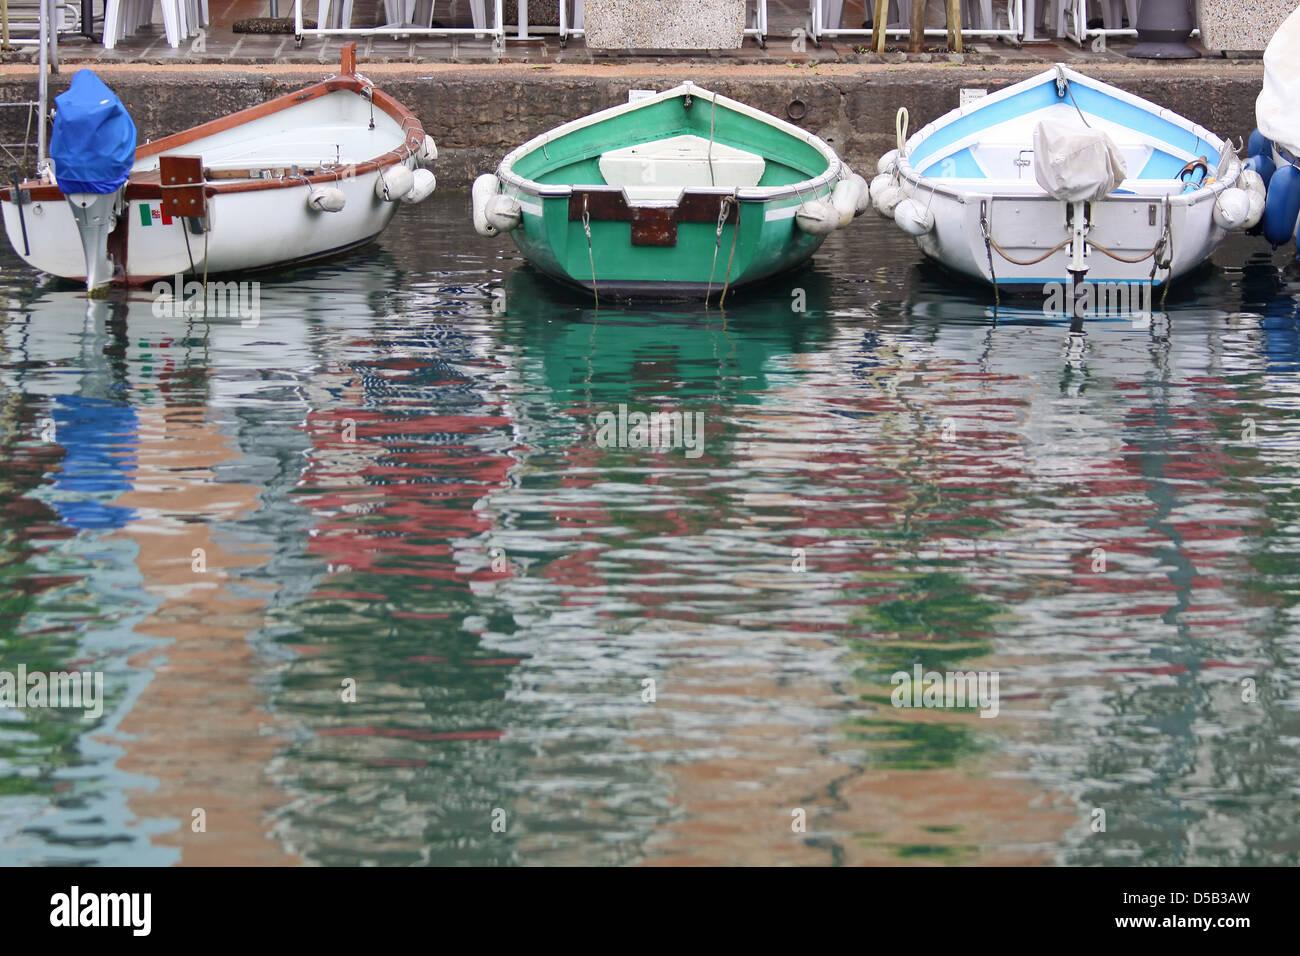 Rowing boats in the harbor of Desenzano on Lake Garda, Region of Brescia, Lombardy, Italy - Stock Image